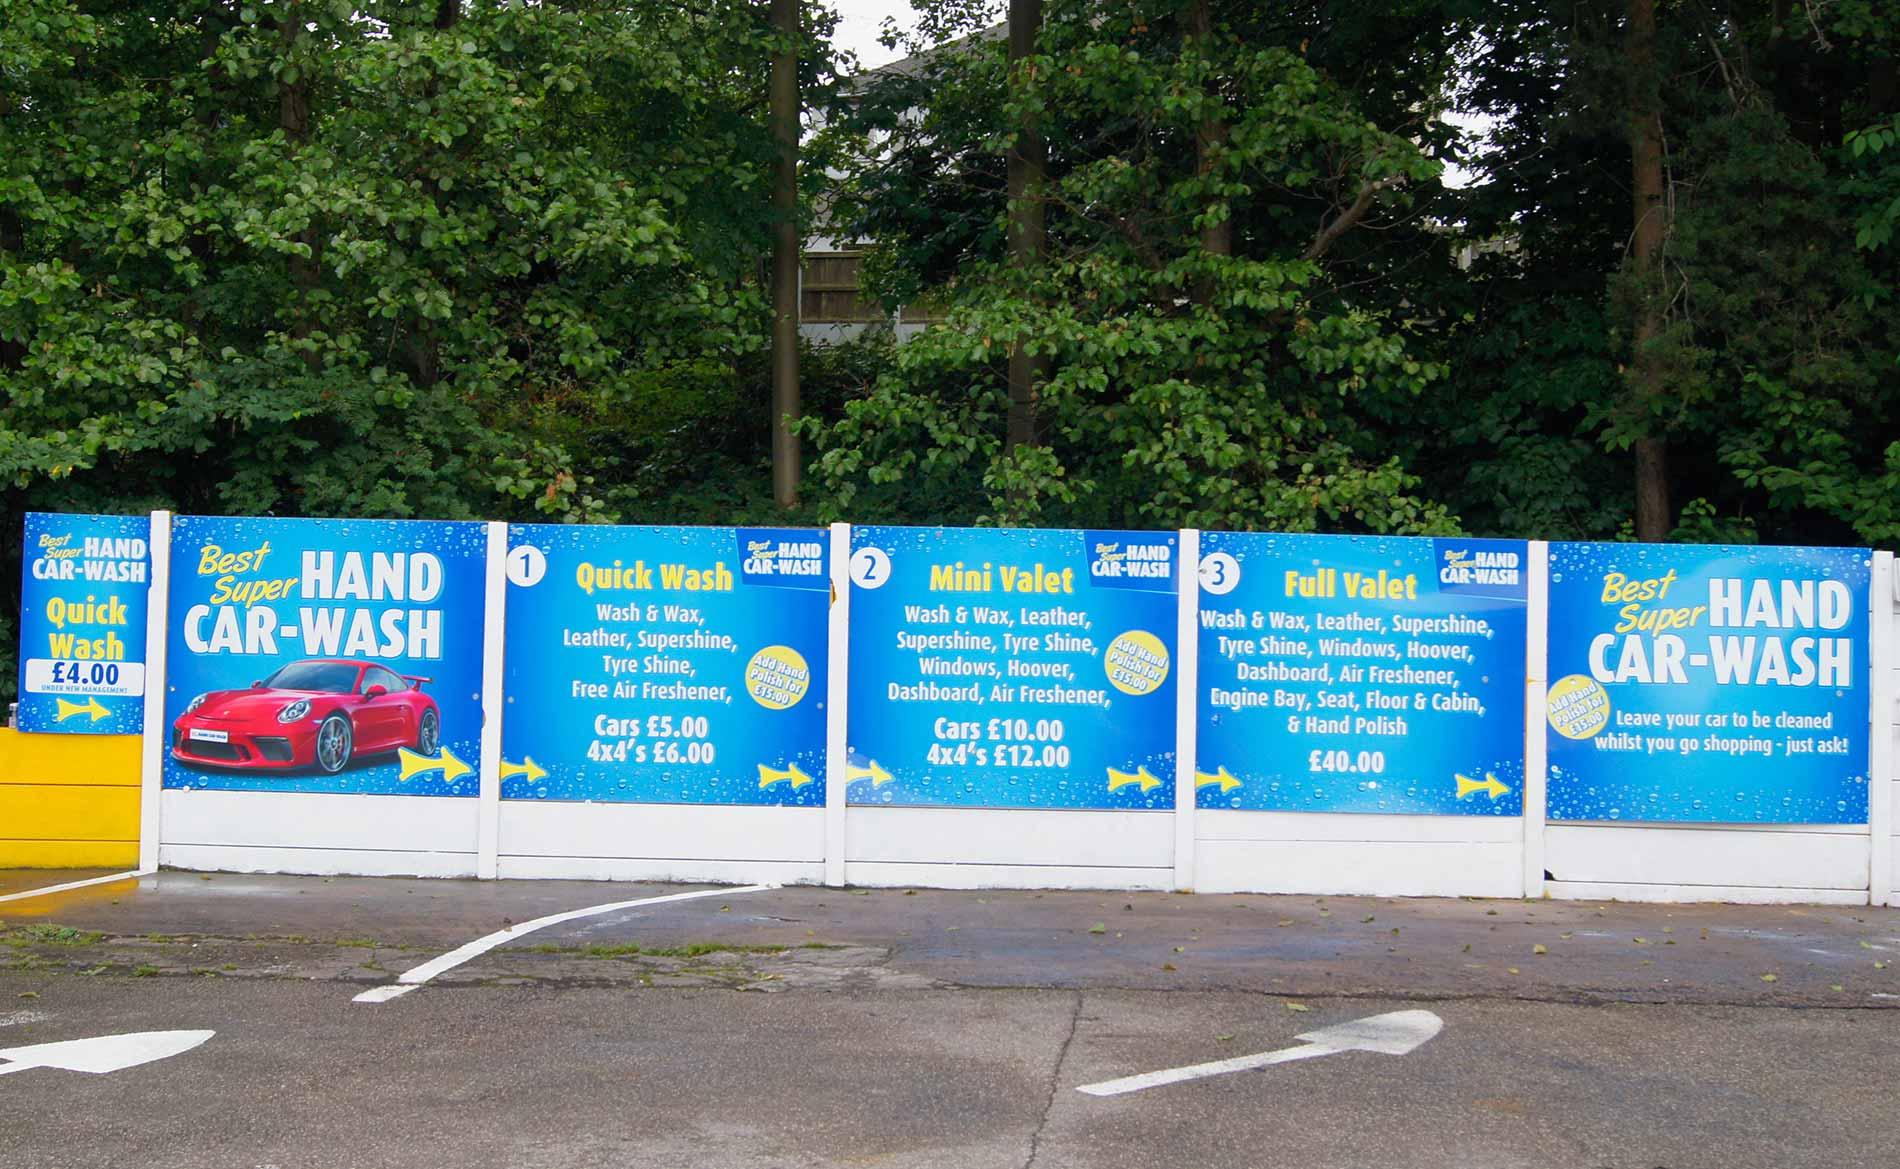 Best Super Hand Car Wash Sherwin Rivers Ltd Staffordshire S